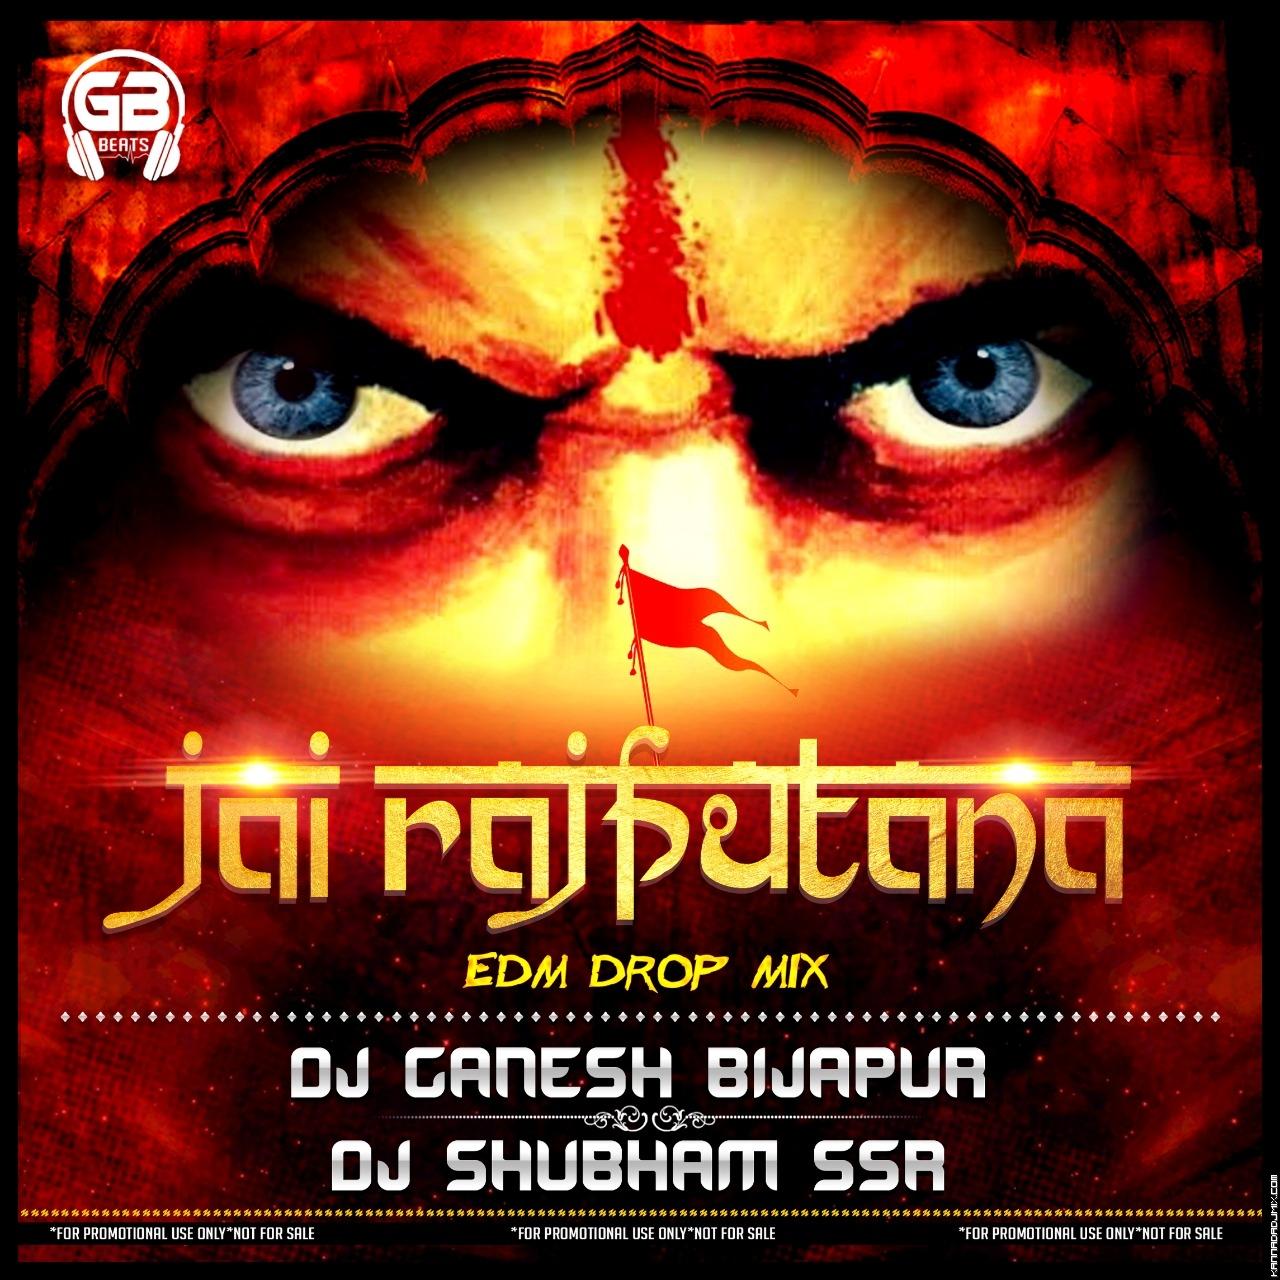 JAY MAHARANA JAY RAJPUTANA_Edm_Drop_MIX DJ GANESH [BIJAPUR] AND DJ SHUBHAM SSR.mp3